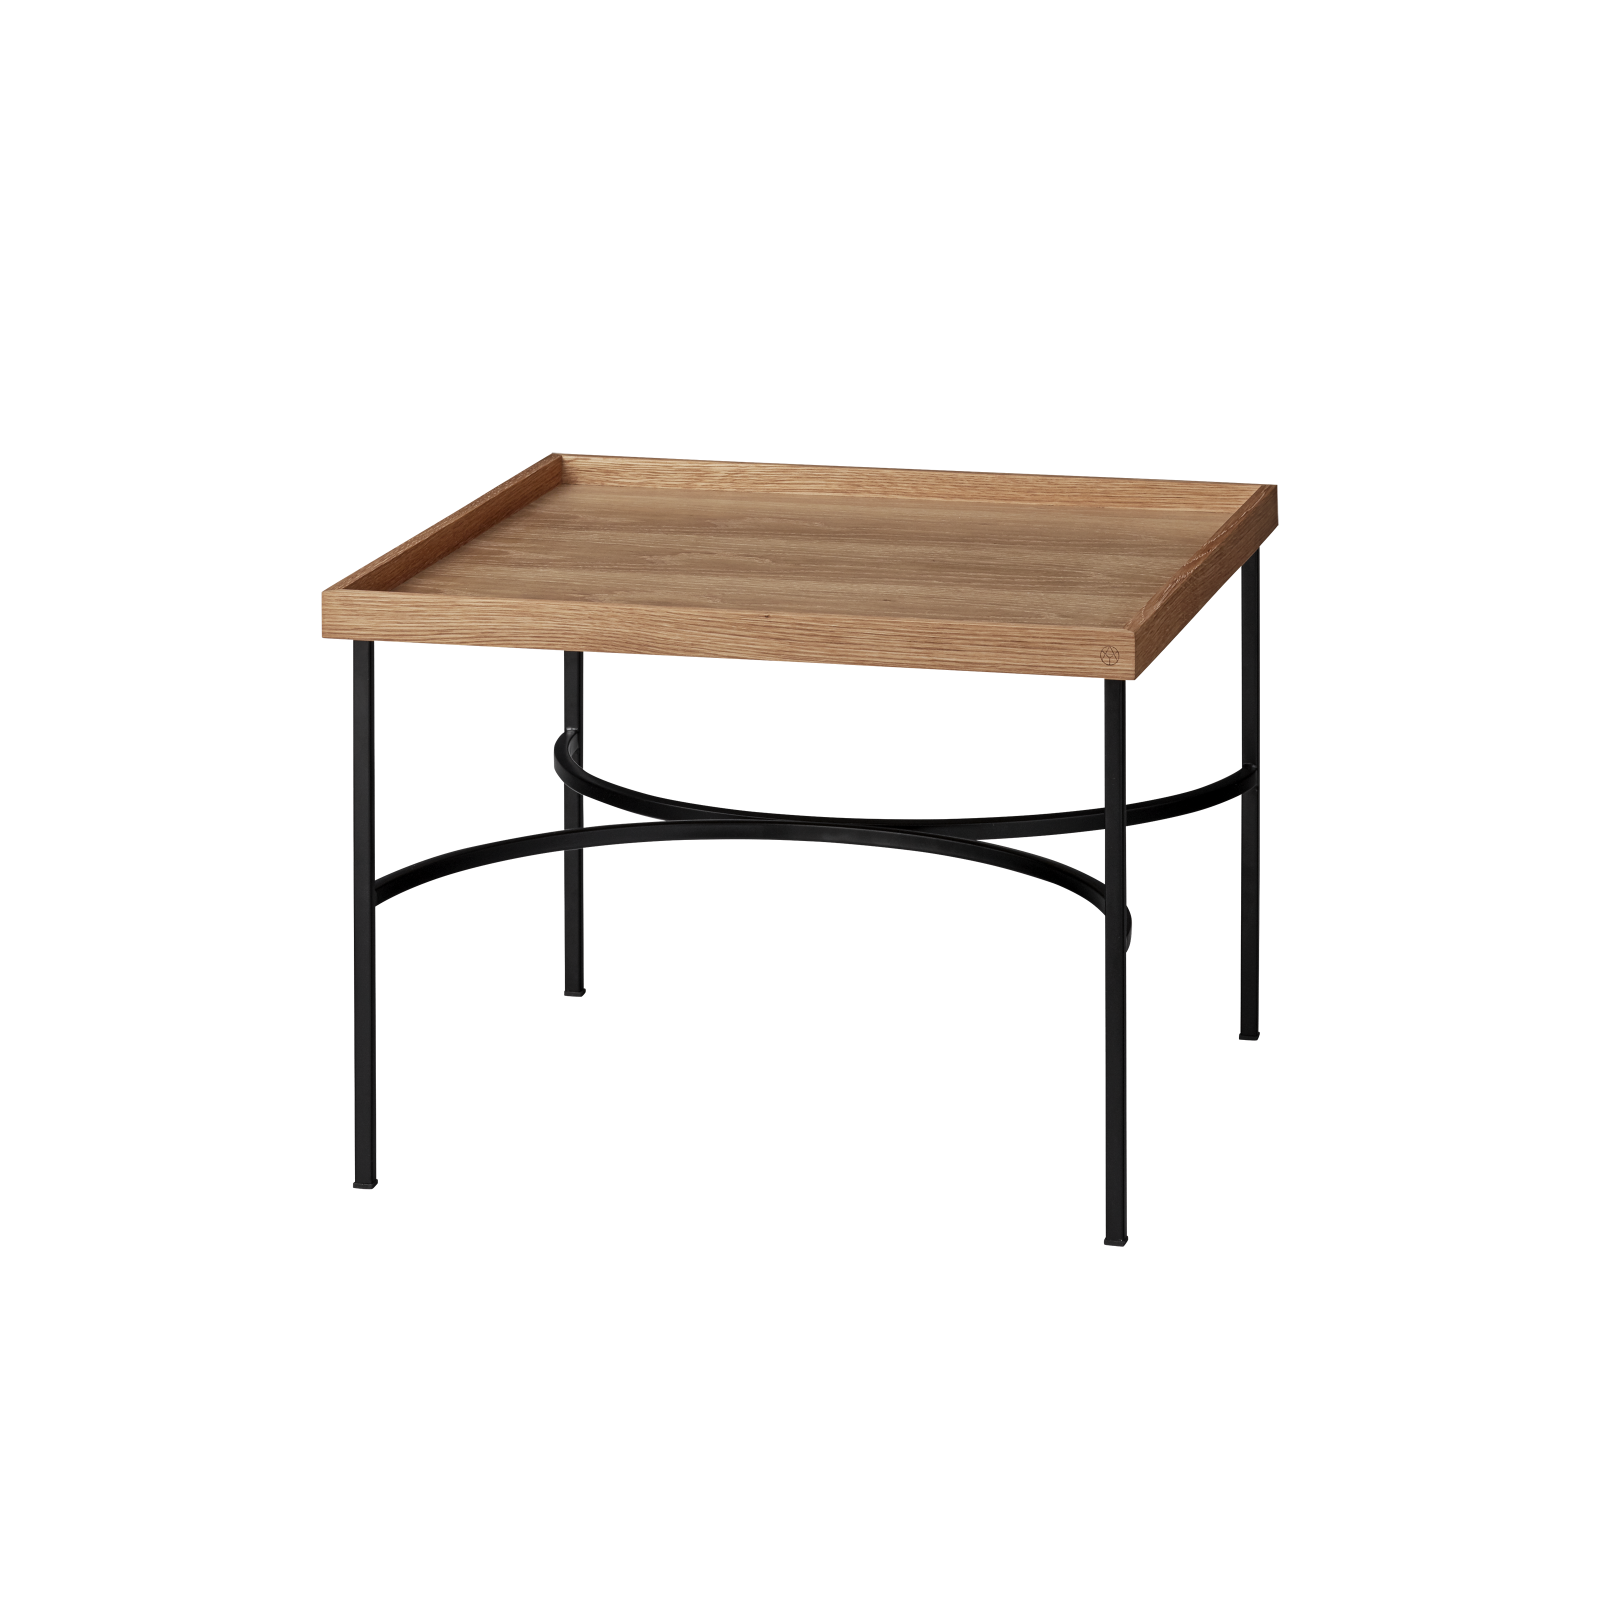 Bord UNITY table svart/ guld, AYTM